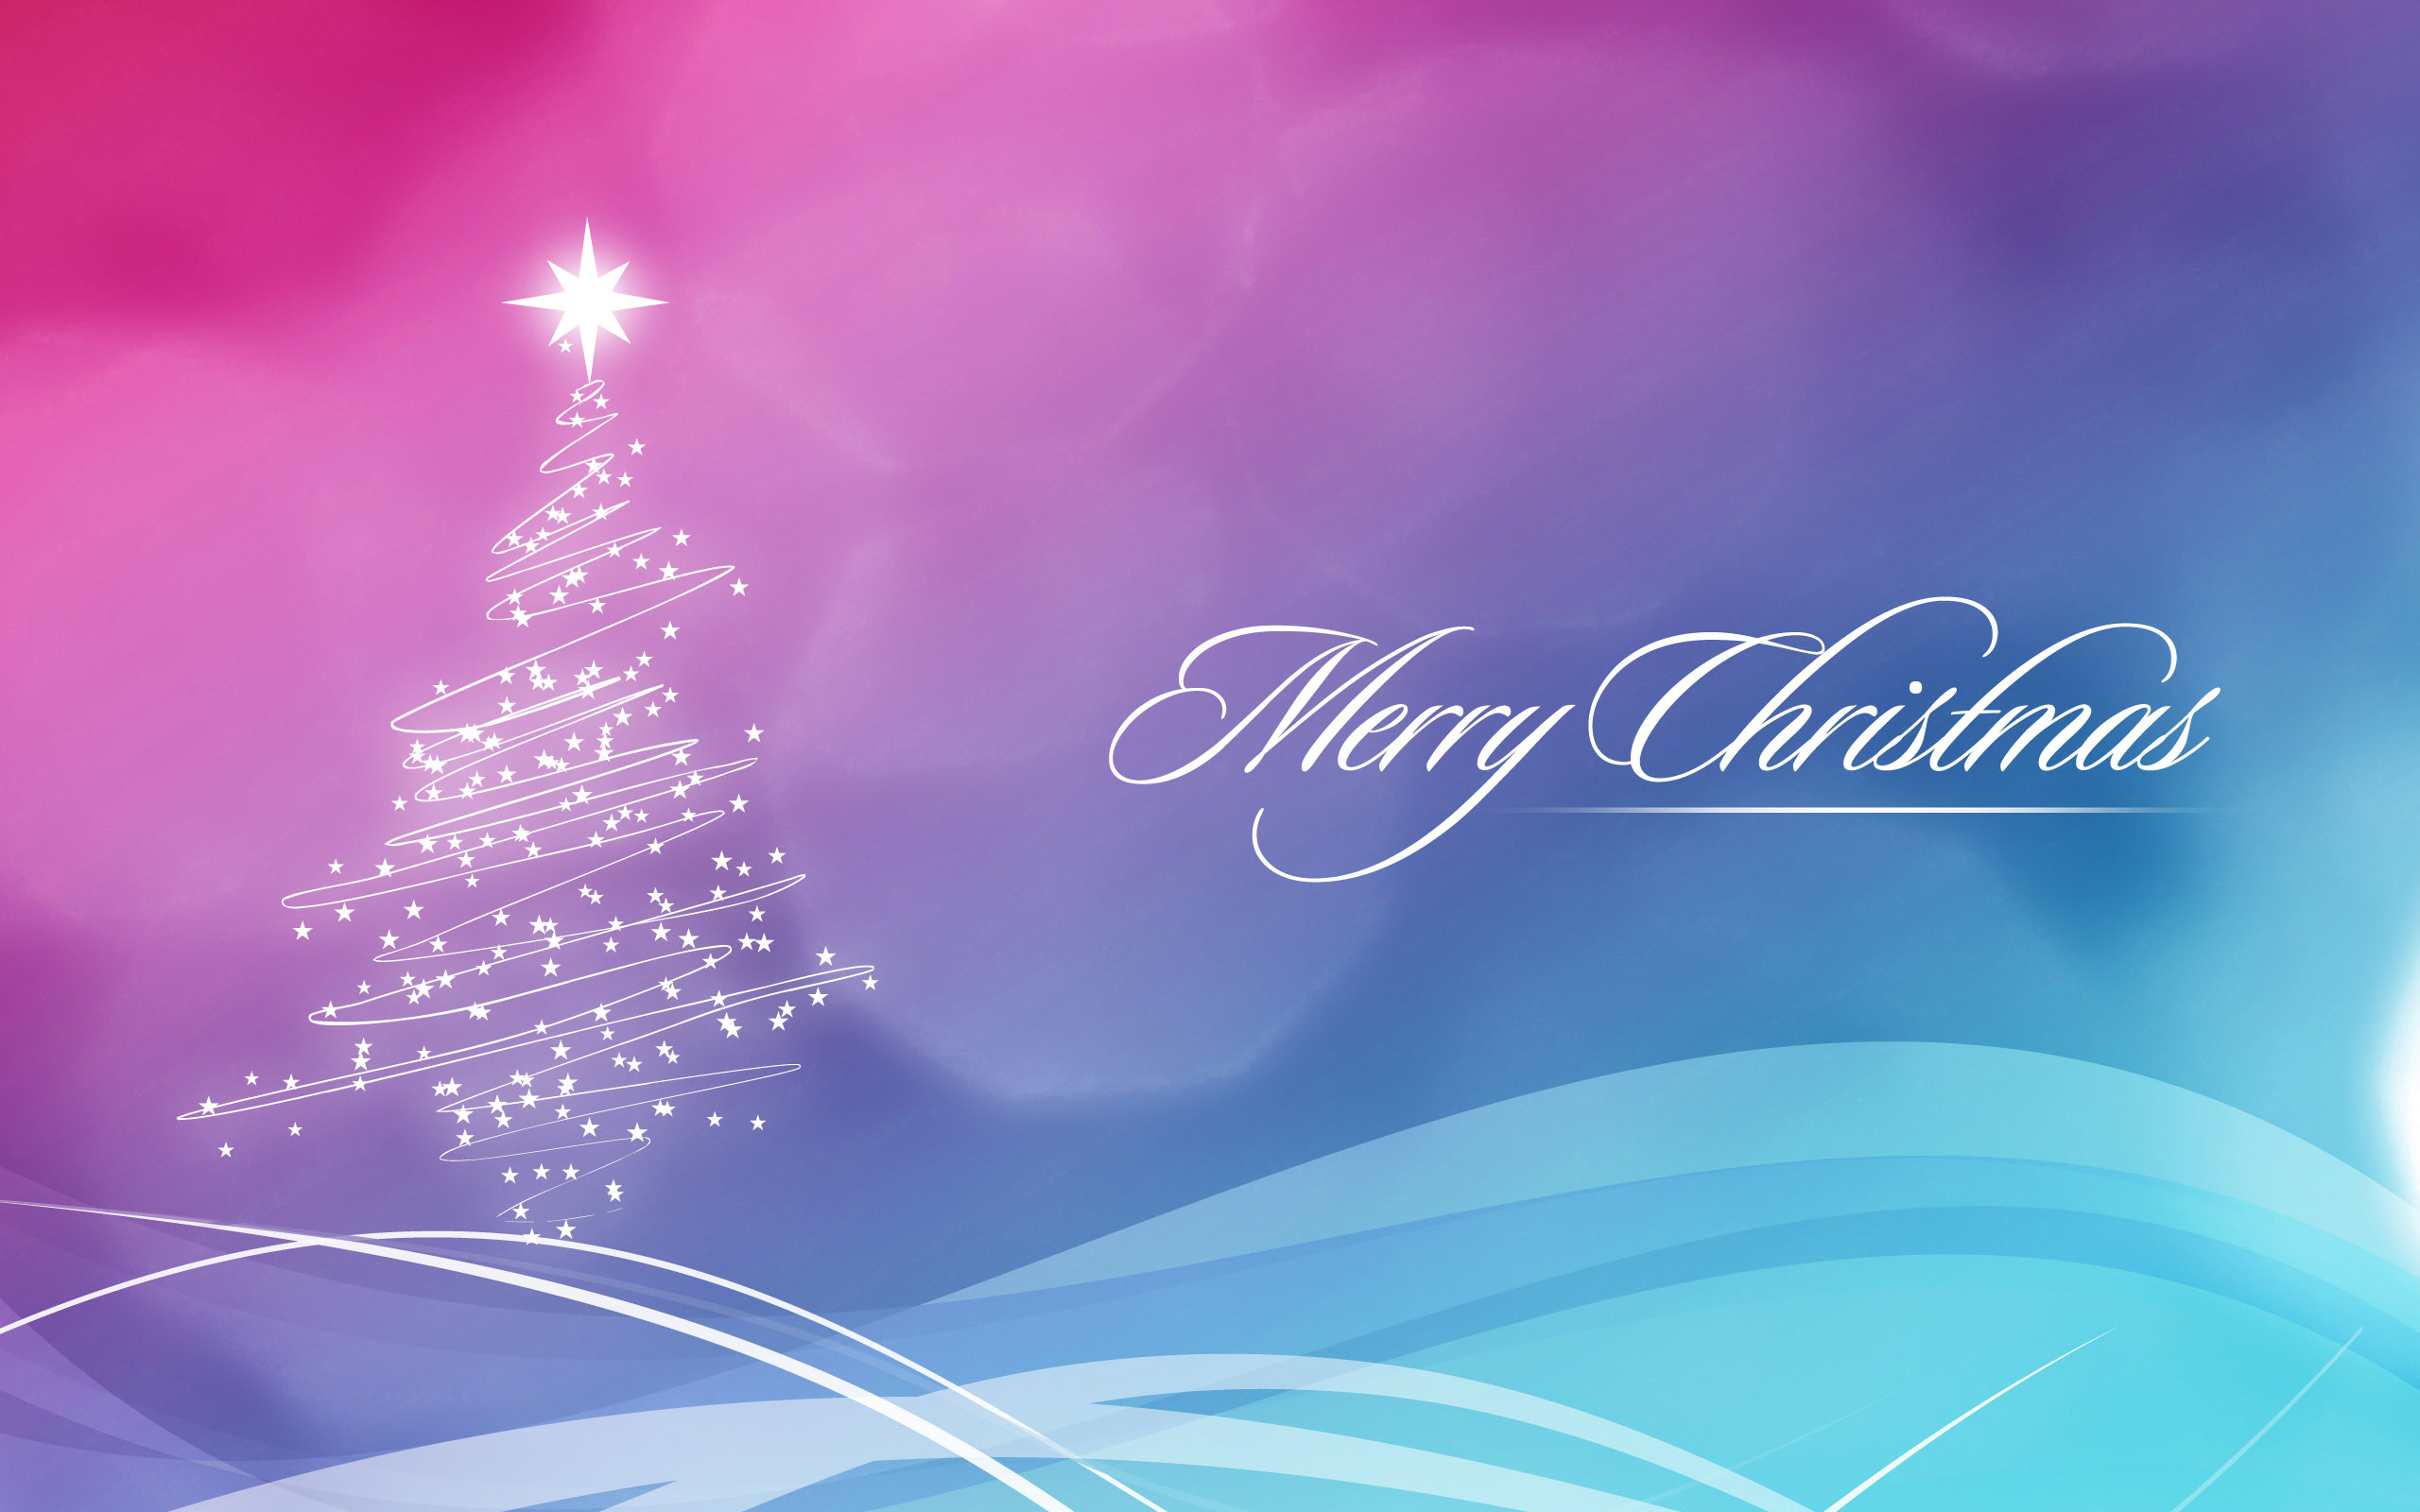 Merry-christmas-Wallpaper-HD-Desktop-Background